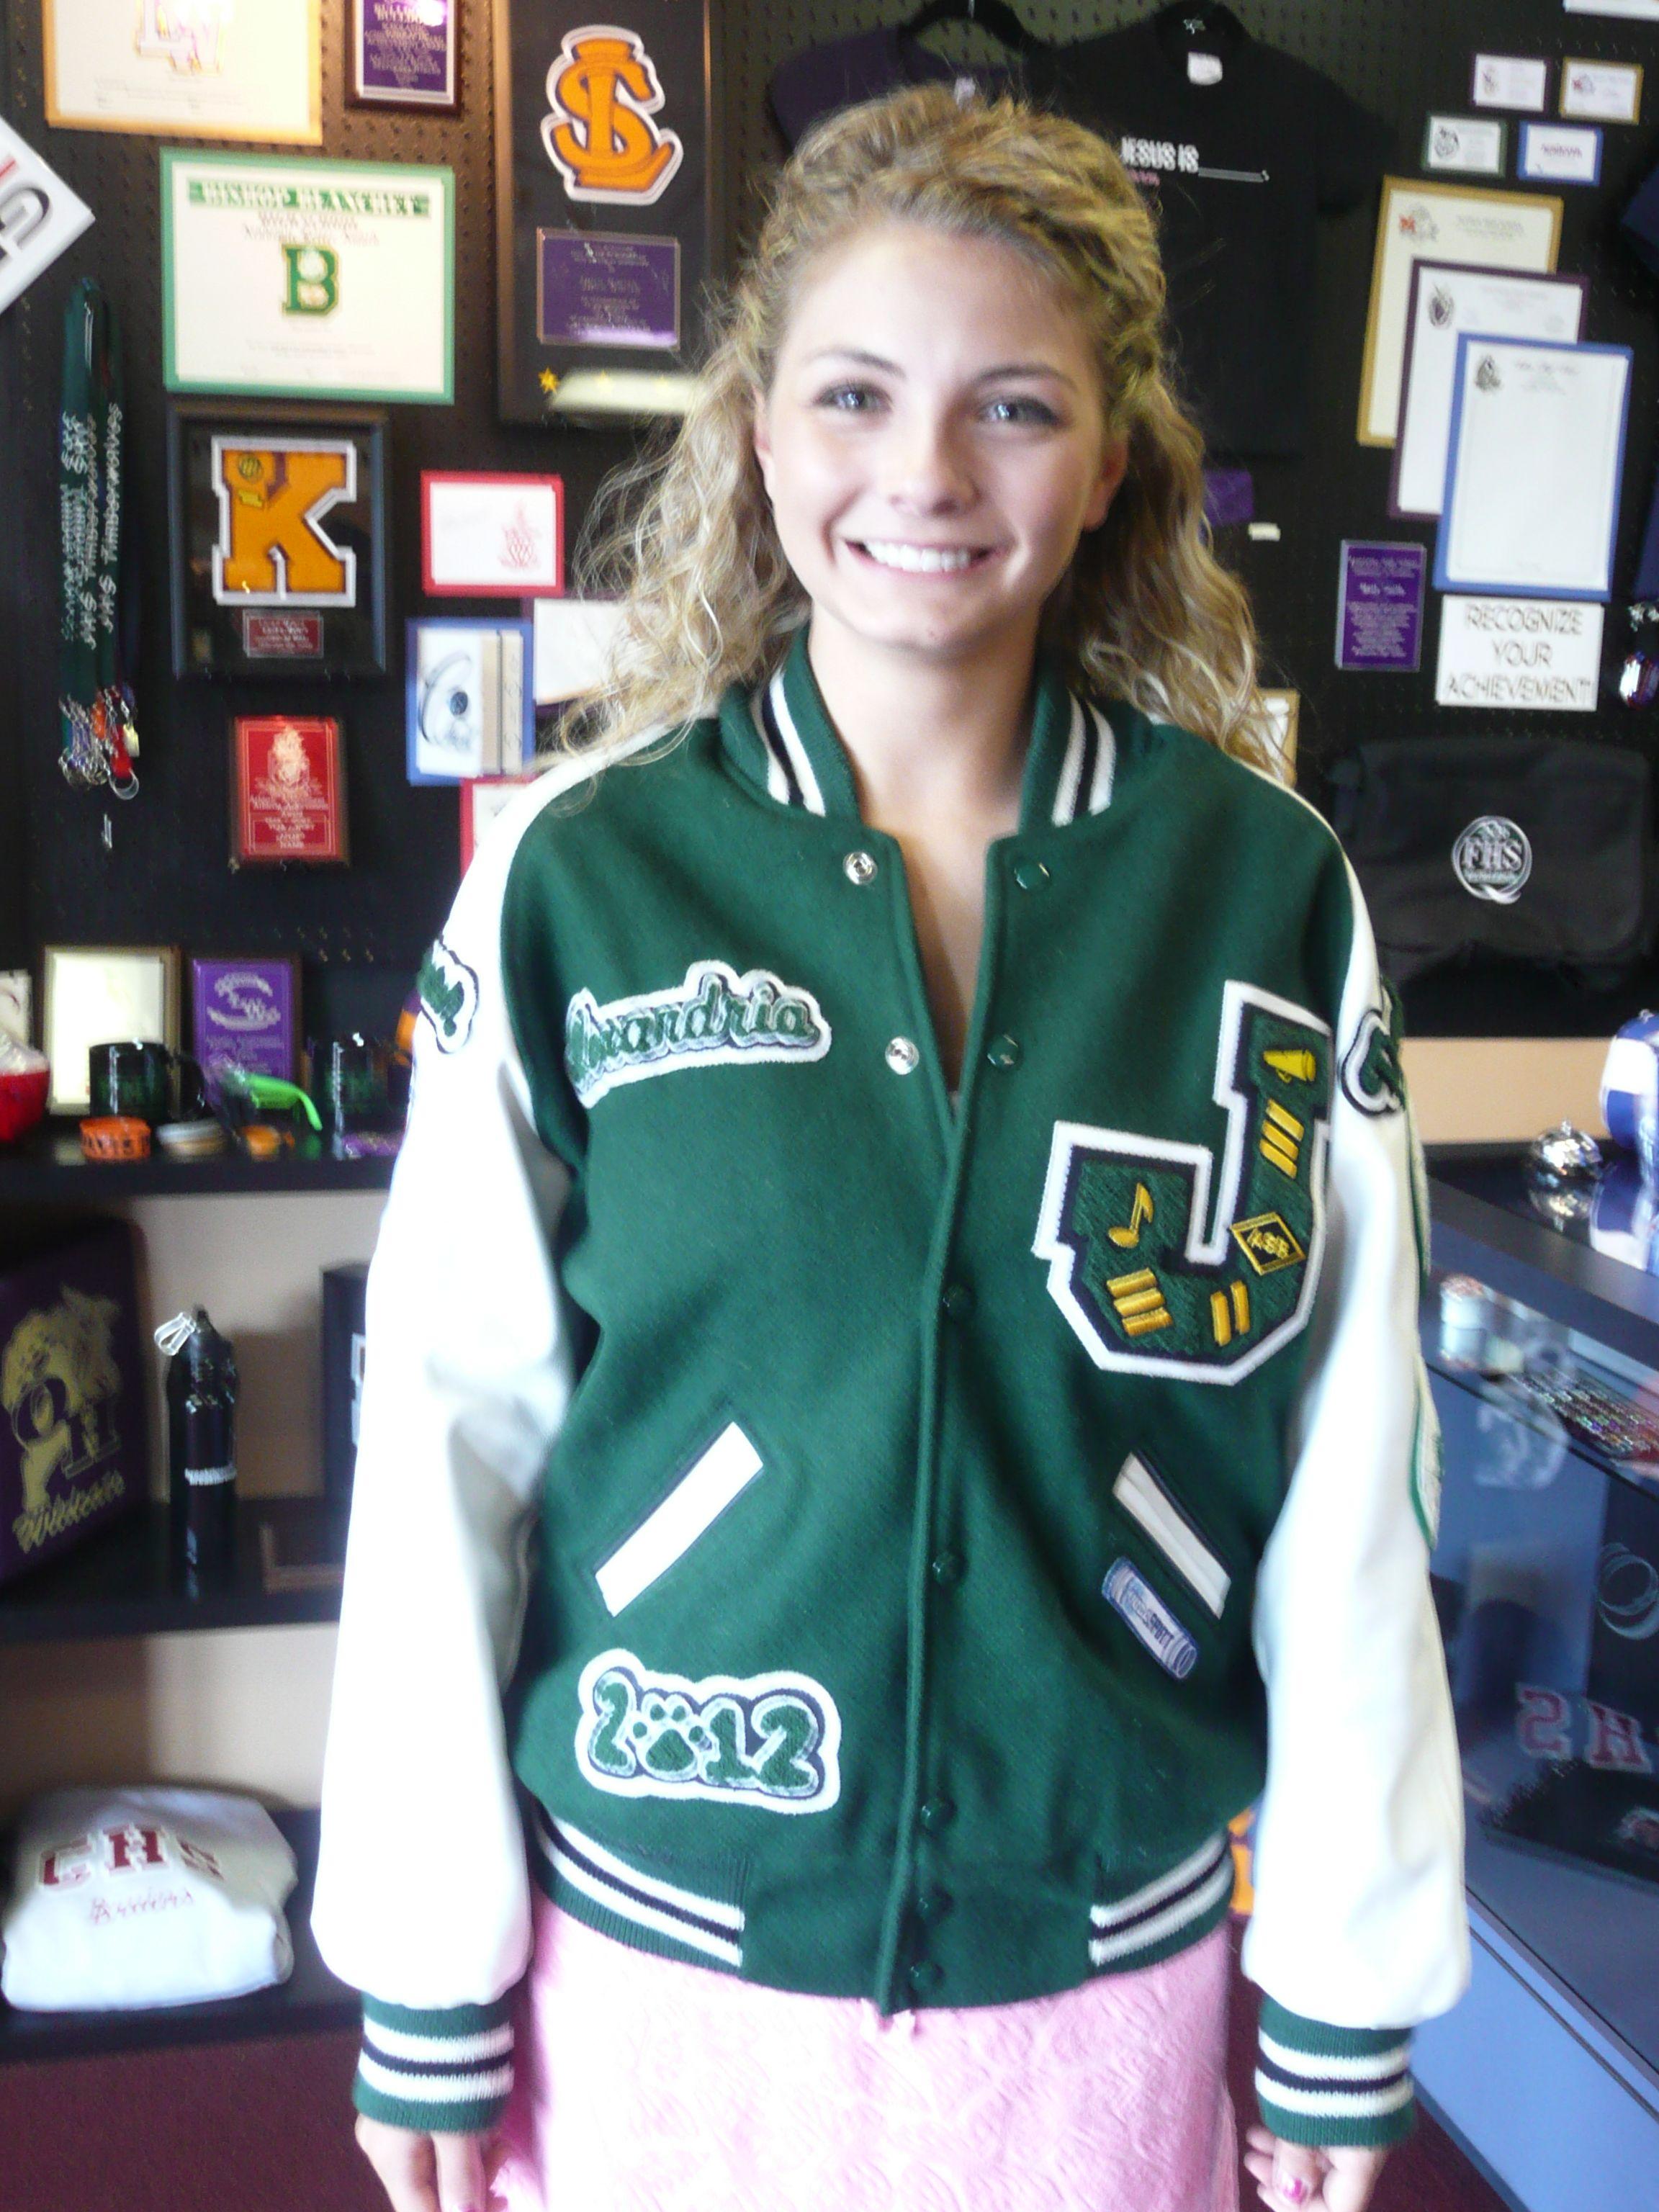 Beautiful Green Girls Varsity Jacket Jackets Letterman Jacket Ideas Letterman Jacket